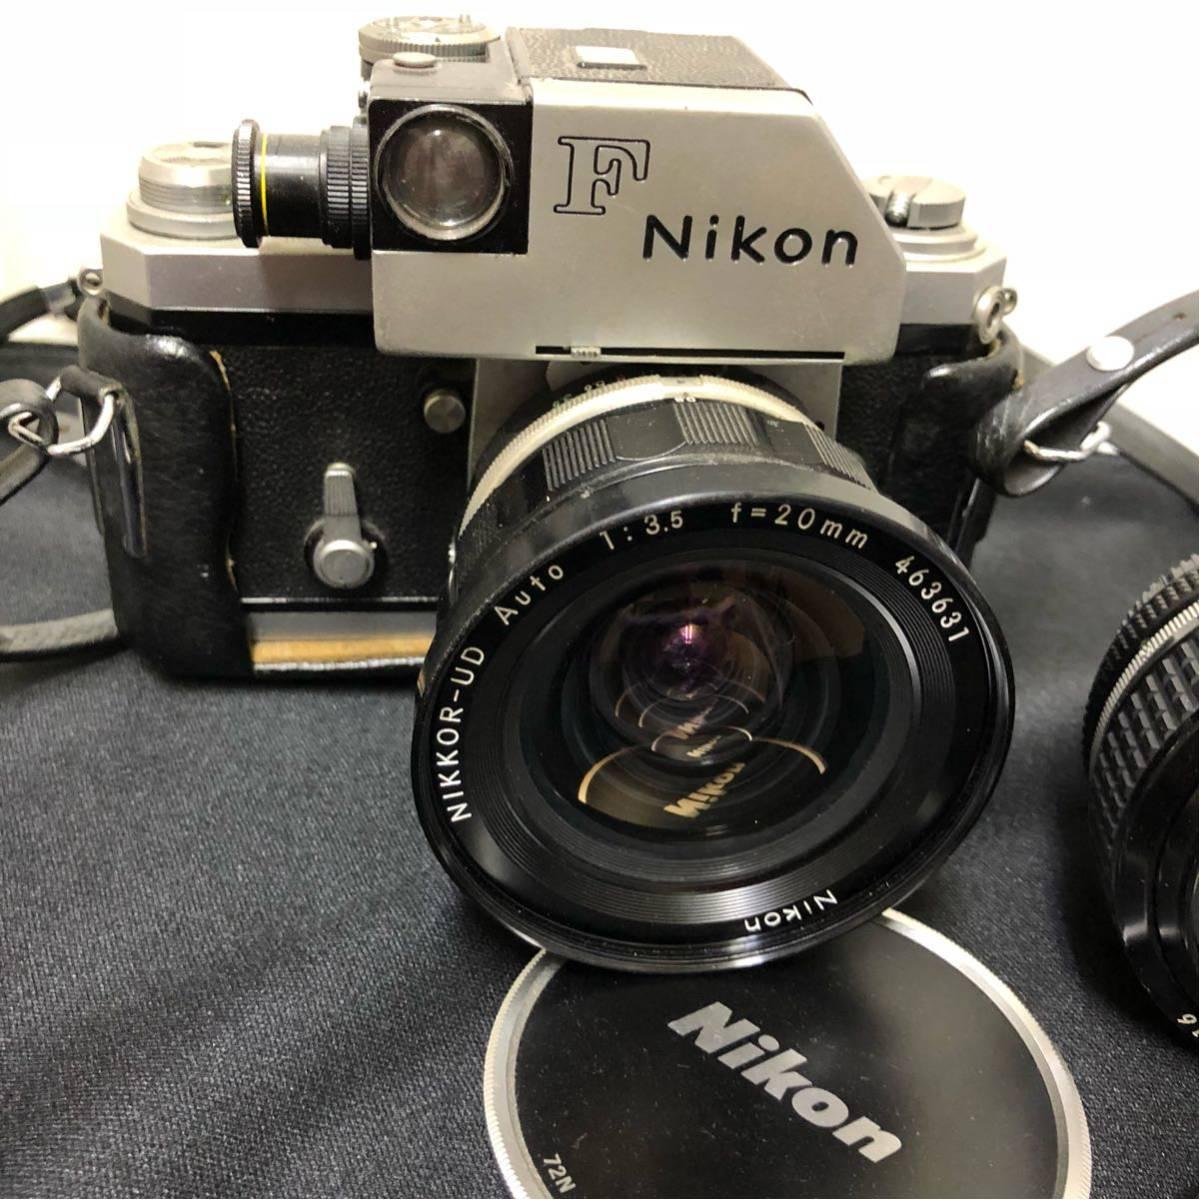 ♯ NIKON ニコン 一眼レフ カメラ F nikkor-ud 1:3.5 20mm nikkor 50mm 1:1.2 レンズ2本セット_画像2